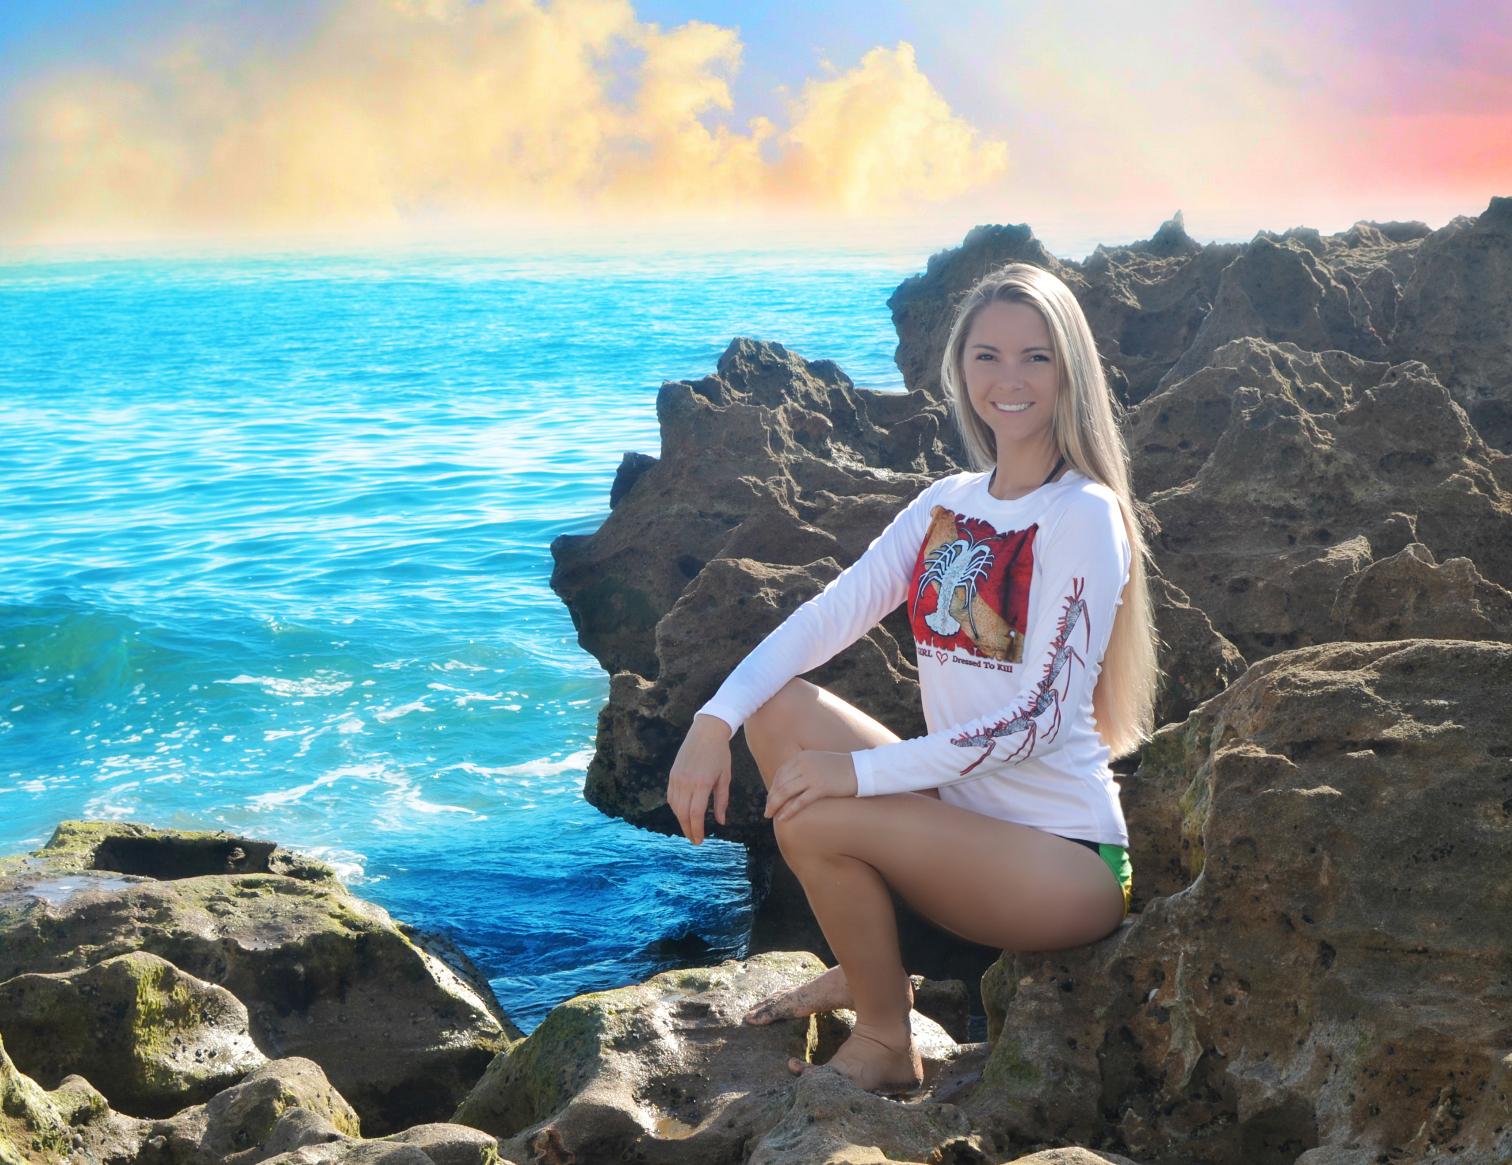 lobster-womens-sunscreen-shirt-kristy-grant-jupiter-florida.jpg